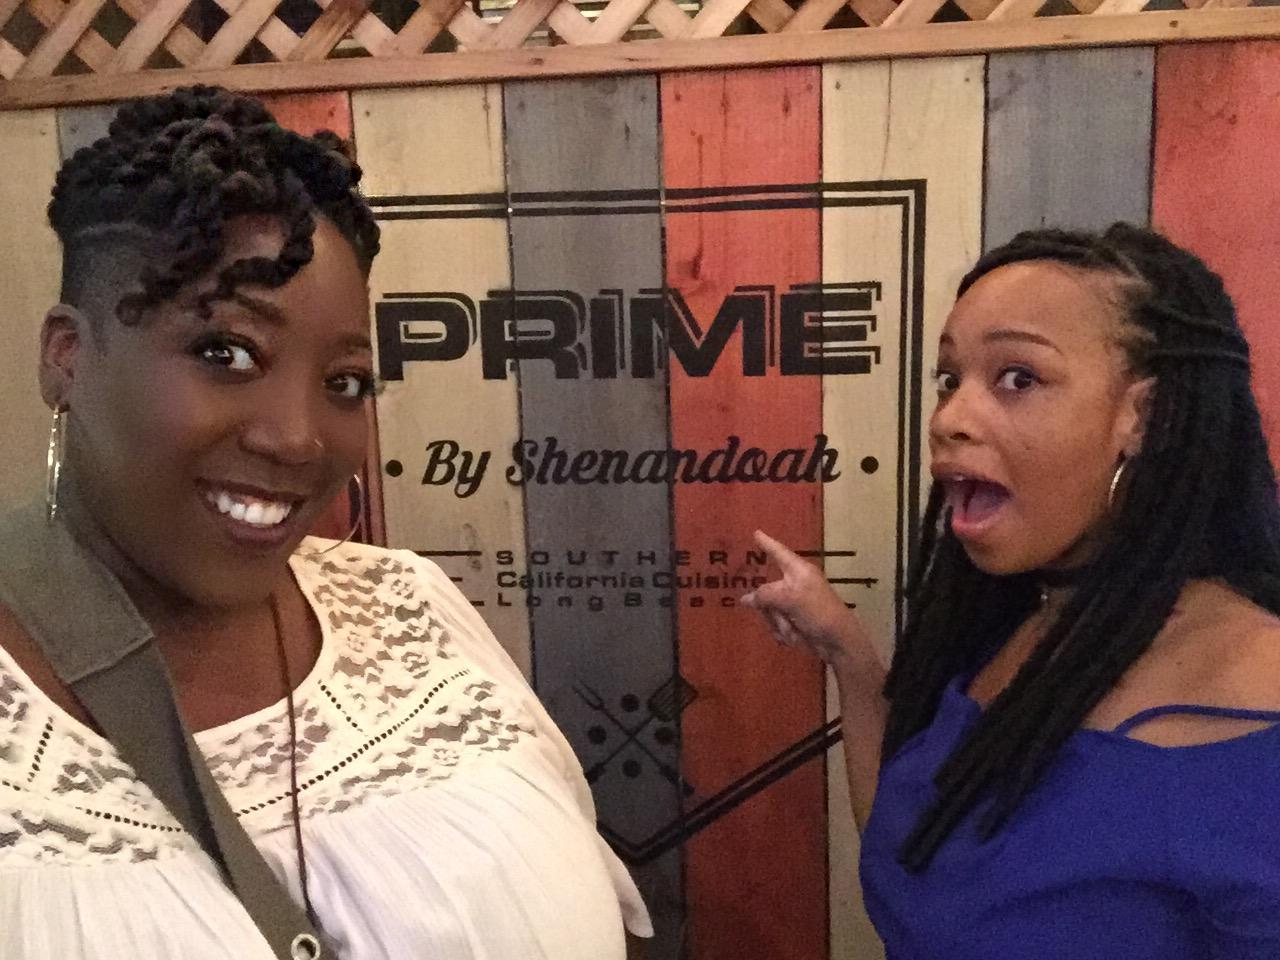 Restaurant Review // Prime By Shenandoah